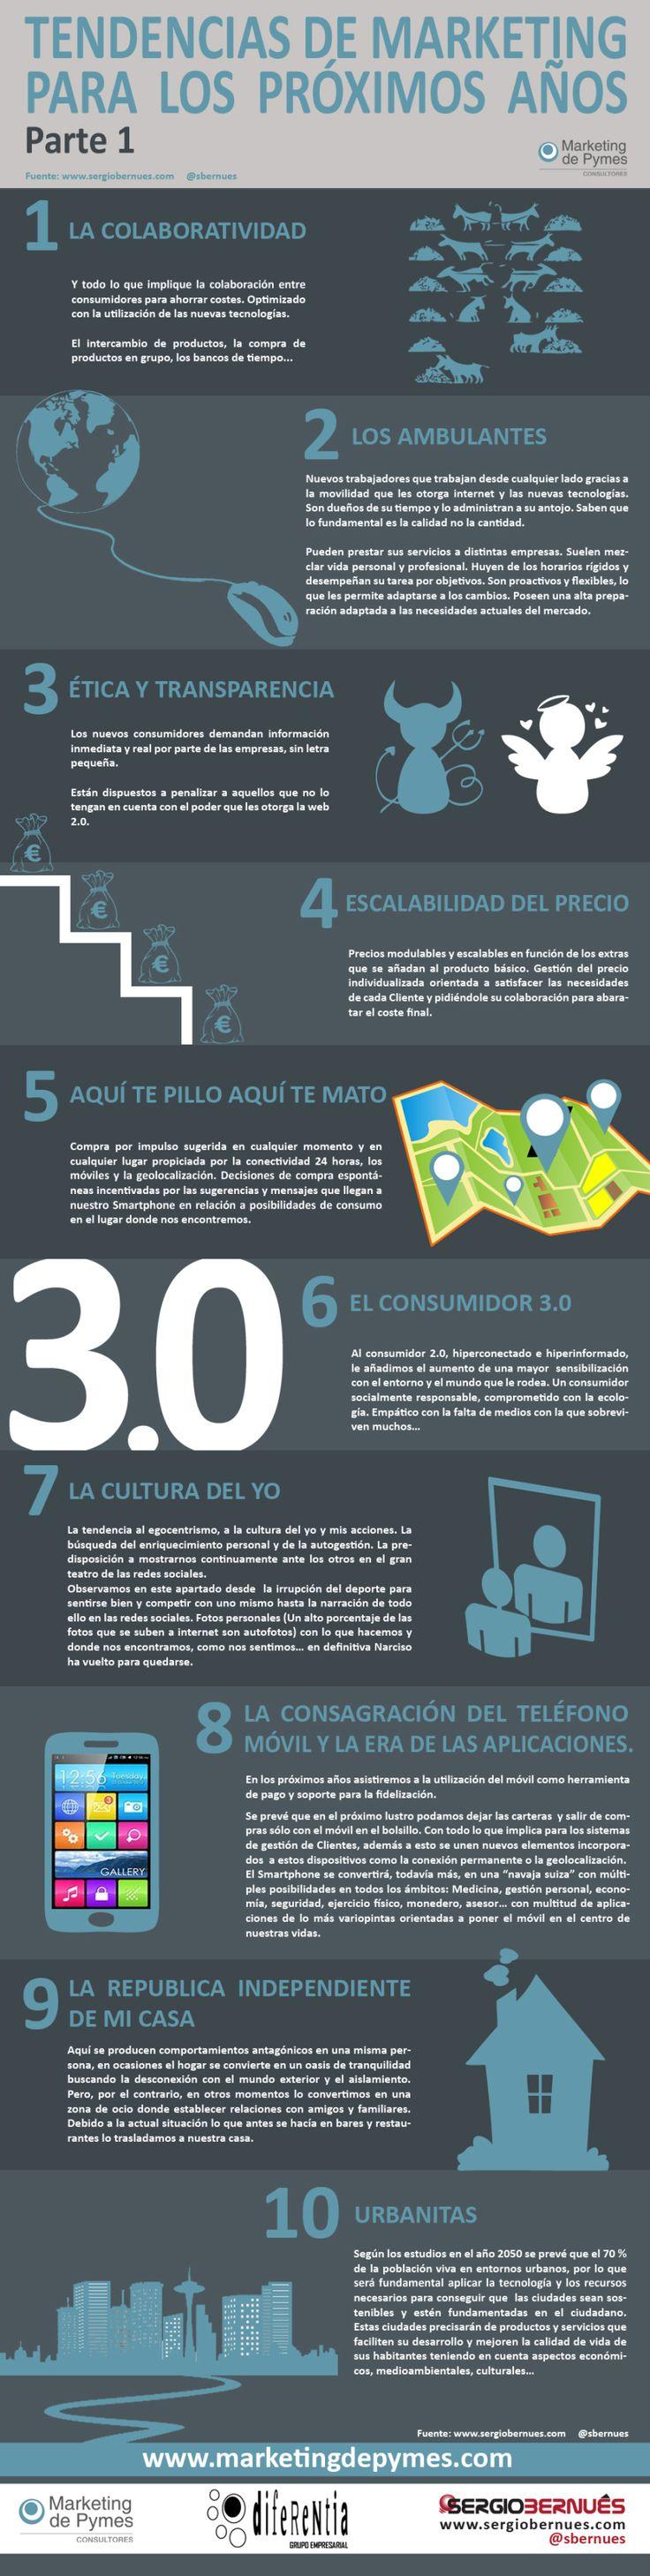 TENDENCIAS DE MARKETING PARA LOS PRÓXIMOS AÑOS (I) #INFOGRAFIA #INFOGRAPHIC #MARKETING